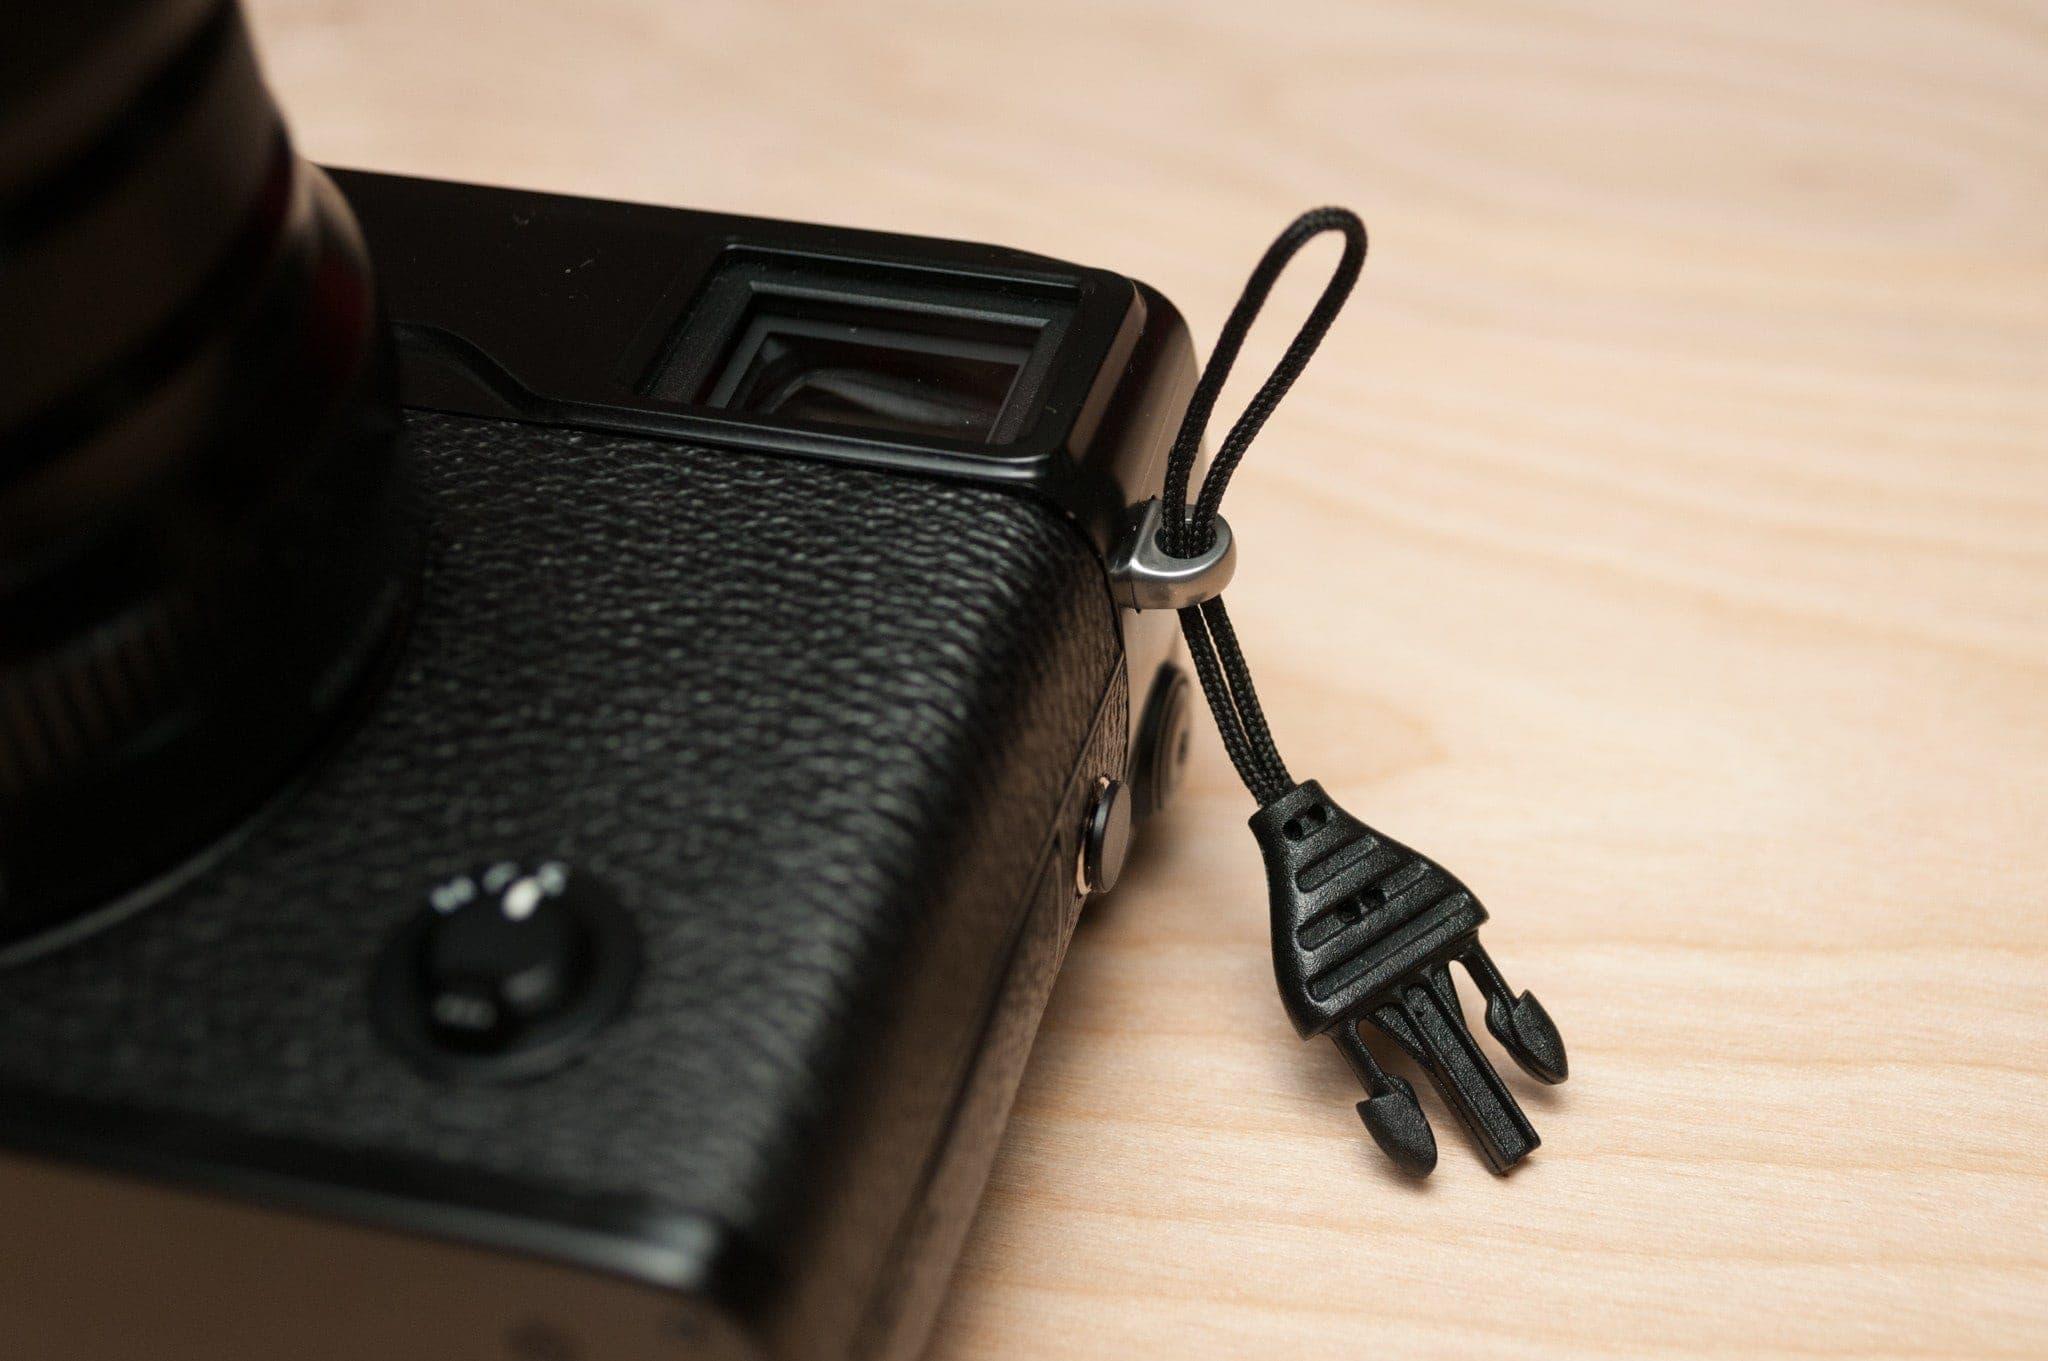 Pase el lazo del cable a través de la correa. Podría ser útil usar un trozo de hilo o hilo dental.